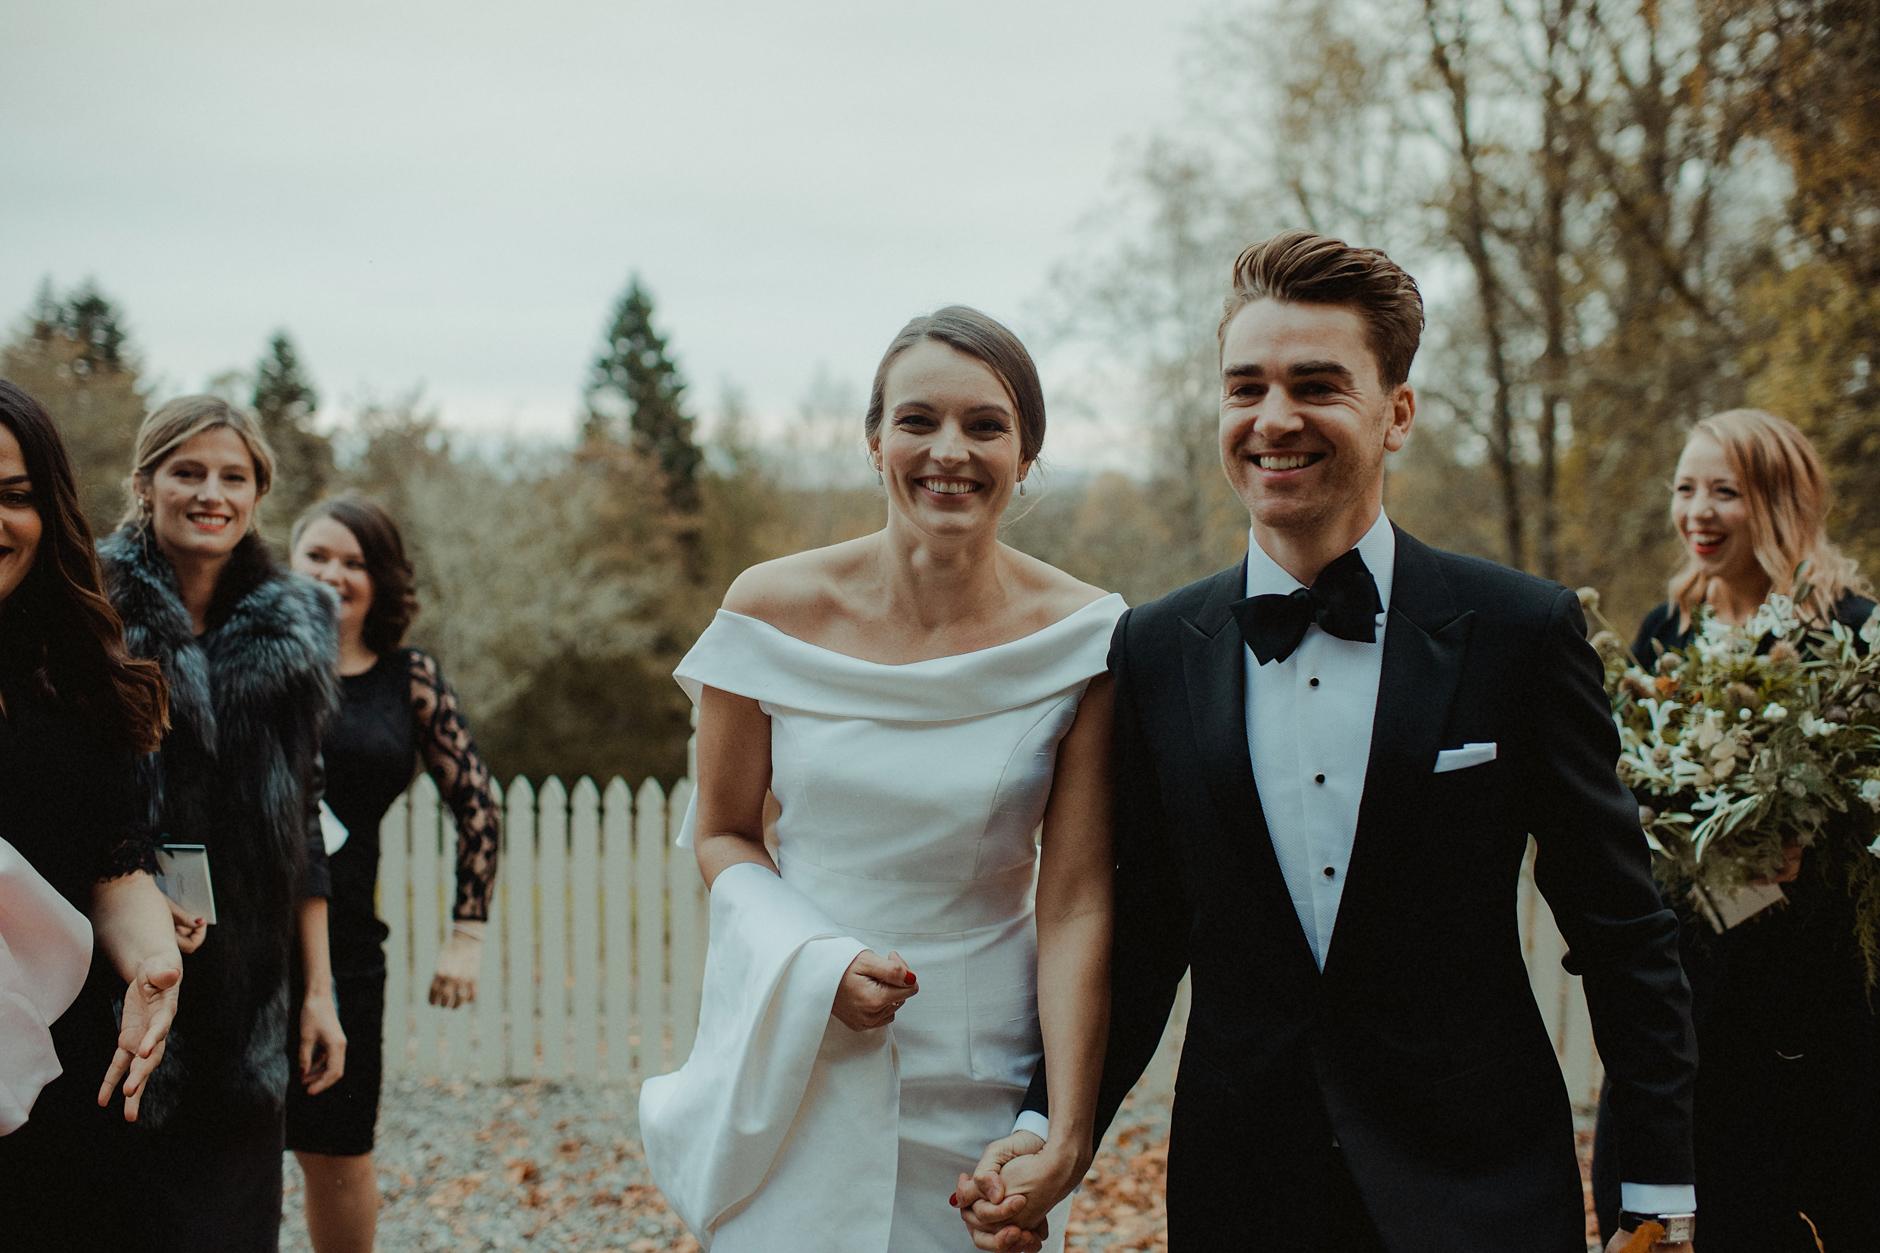 Glentruim-Wedding-Nikki-Leadbetter-Photography-117.jpg